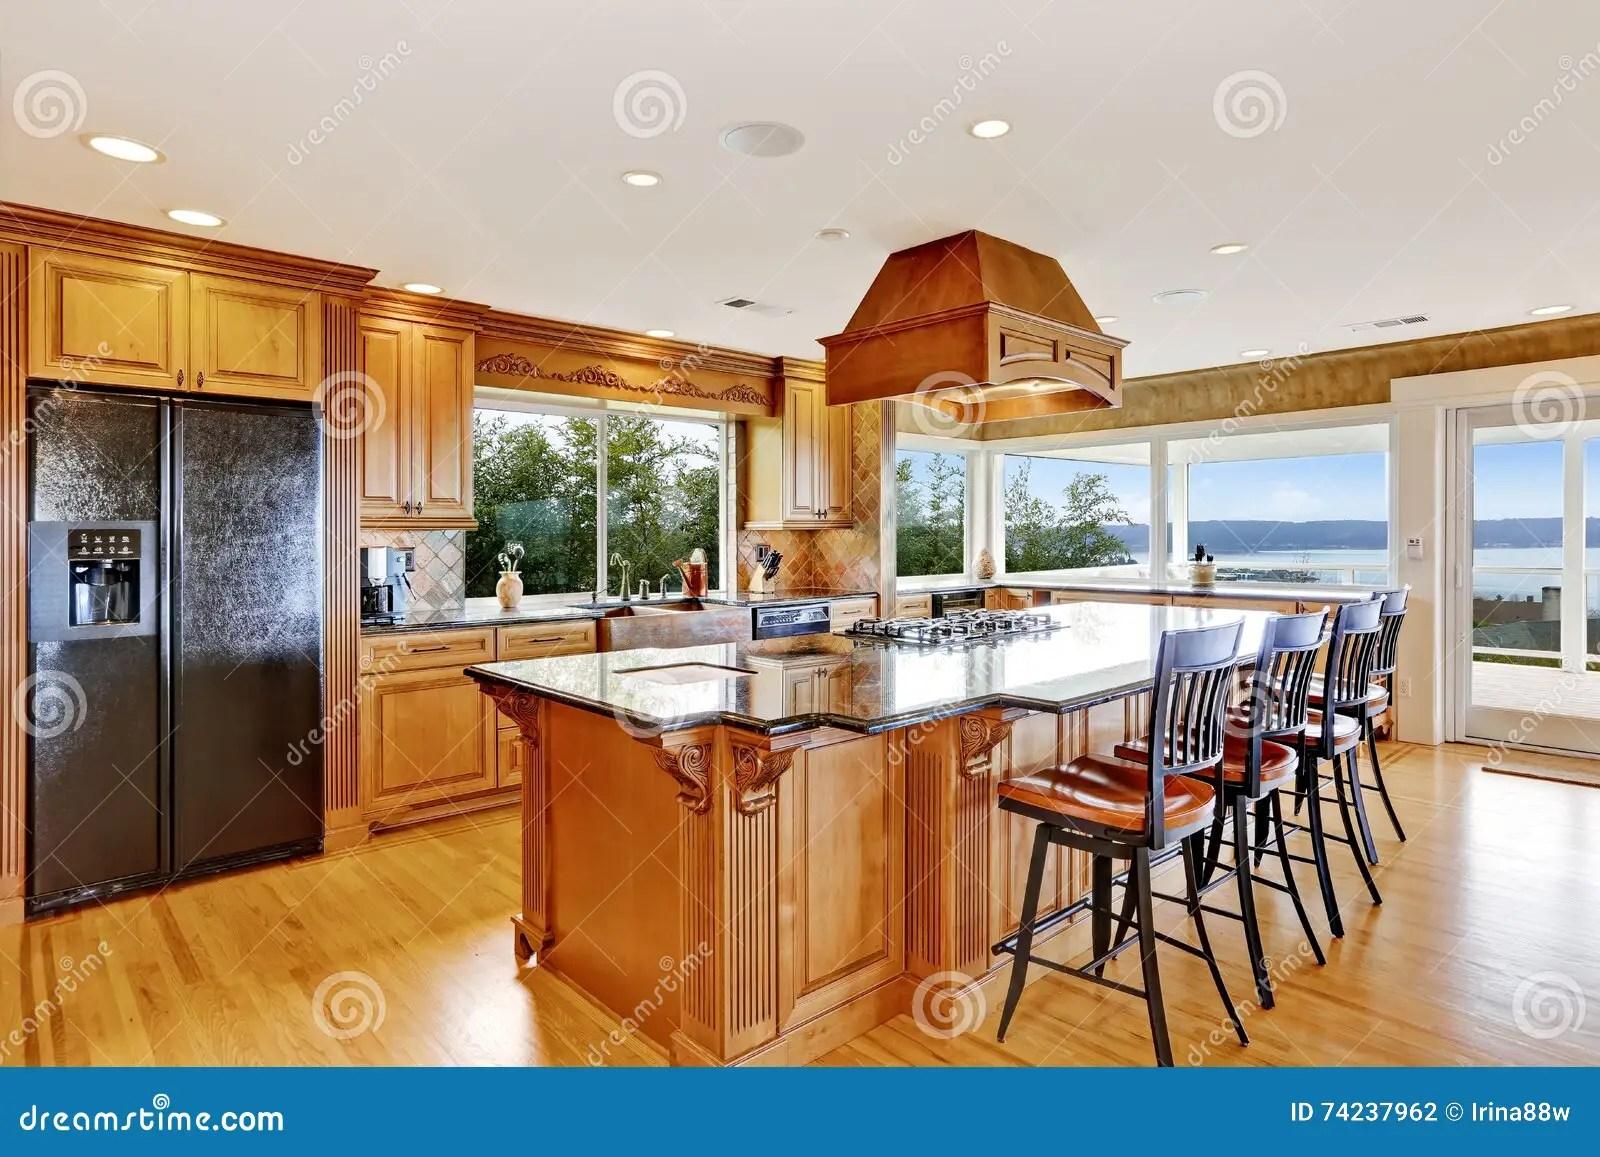 farm kitchen sink how much are remodels 豪华厨房有水视图 海岛和水槽库存照片 图片包括有照亮 现代 冰箱 现代豪华厨房有水视图 海岛和水槽